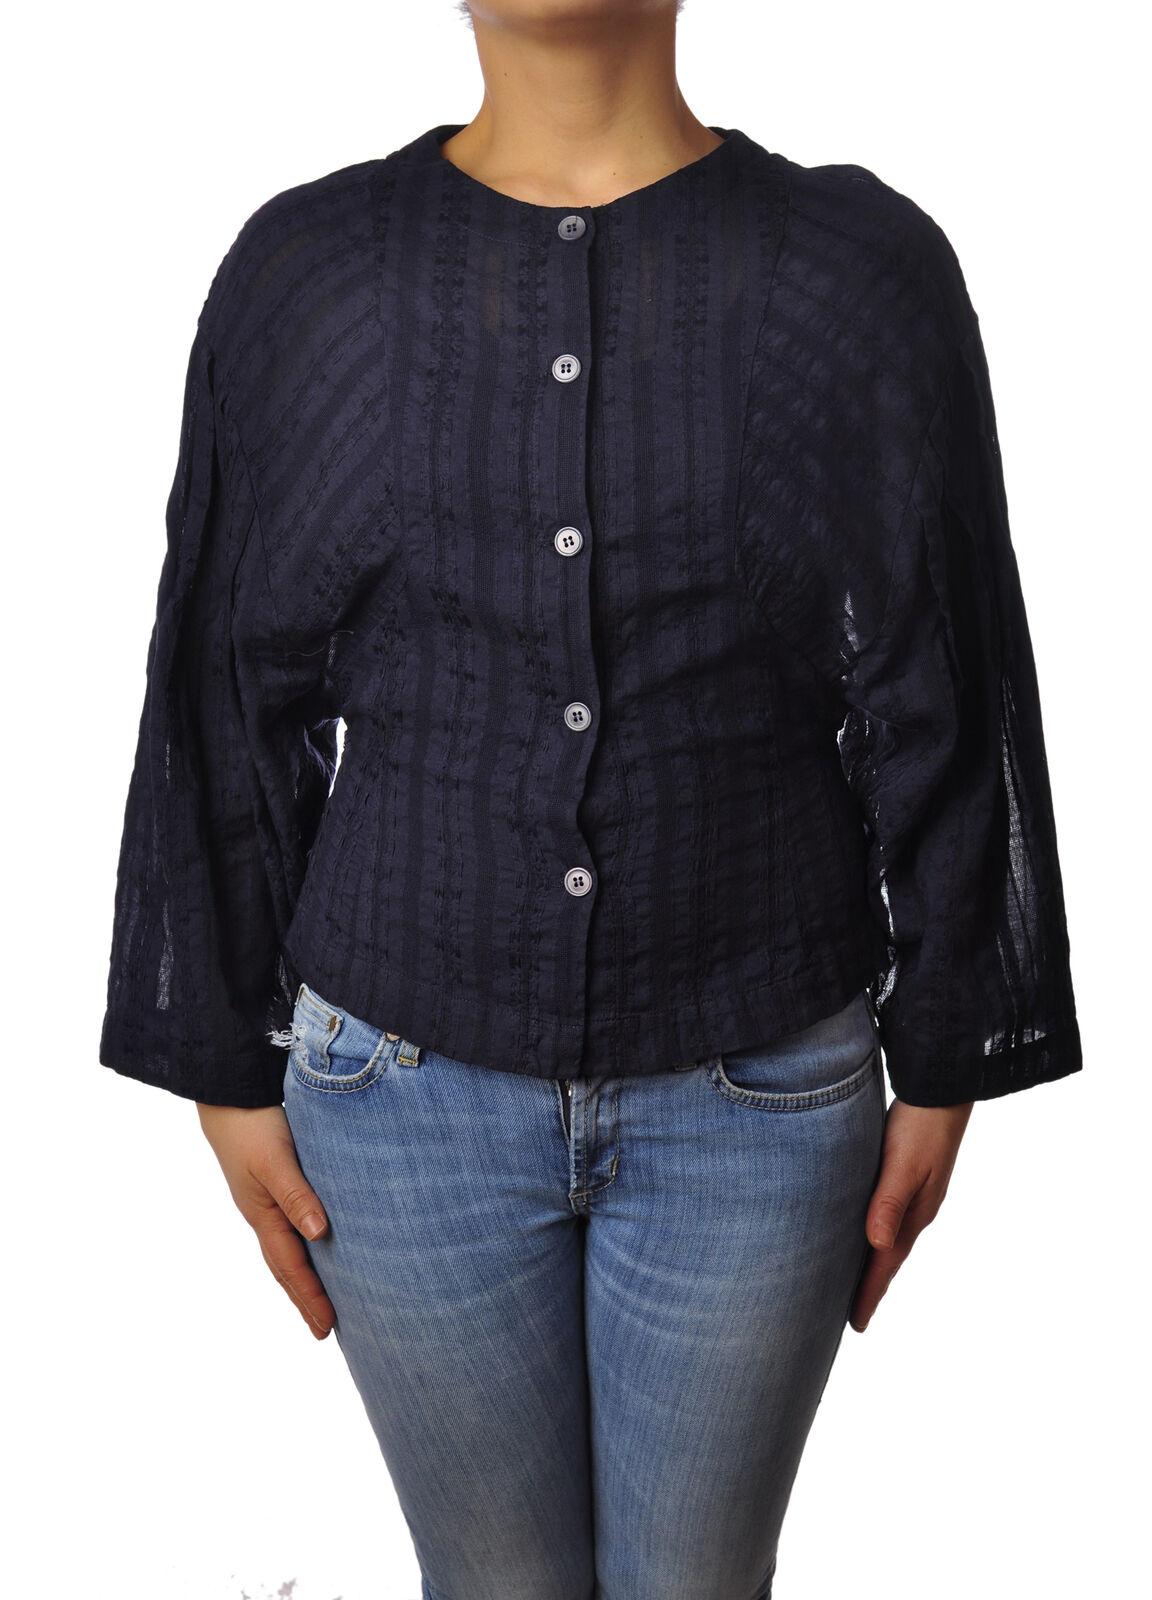 Garage Nouveau - Shirts-Shirts - Woman - bluee - 4979013F181431